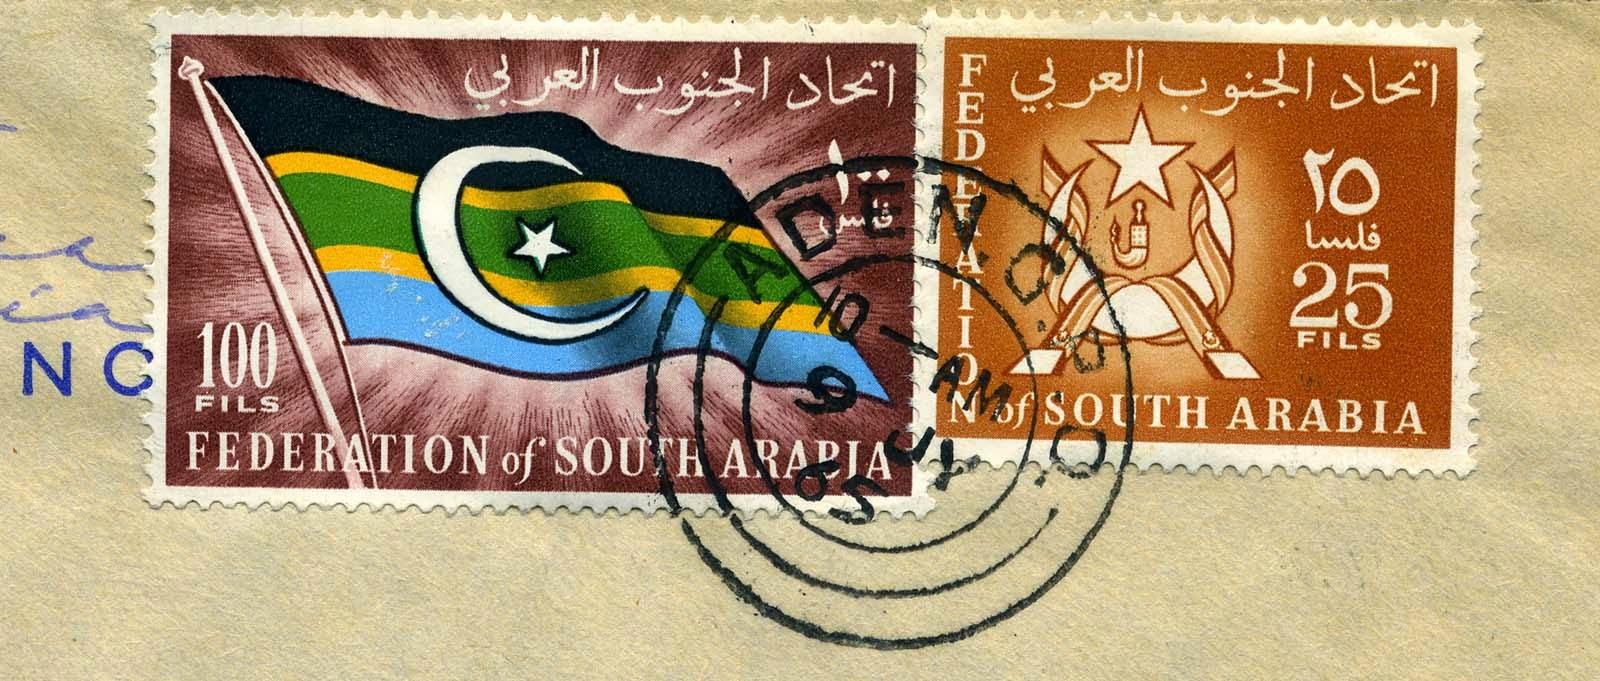 ثورة اليمن 1962 Stamp_South_Arabia_usage